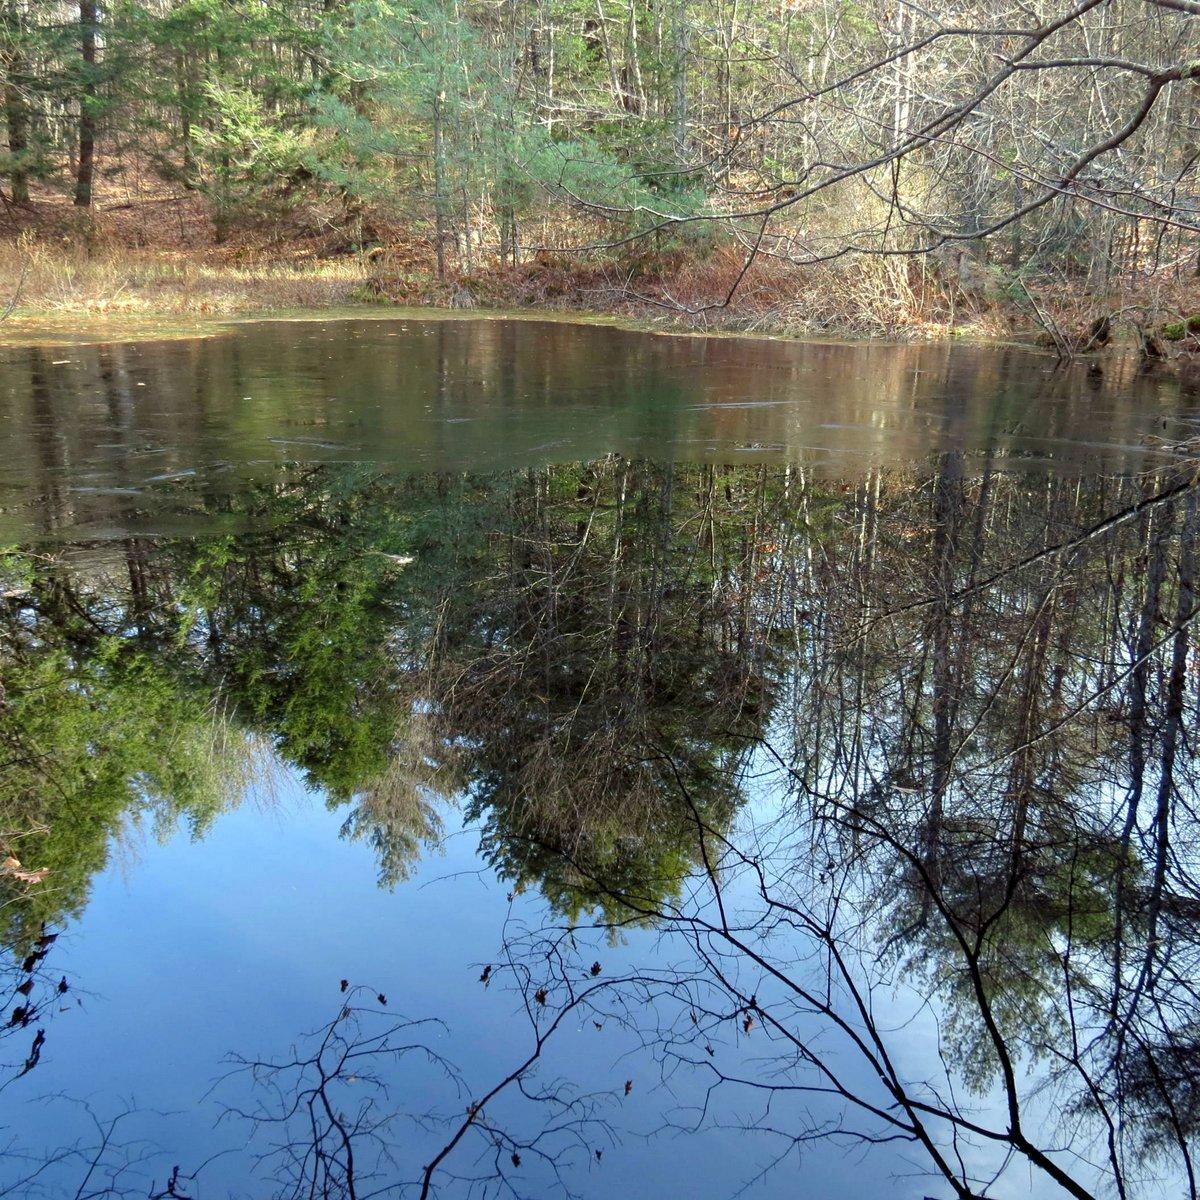 13. Pond Ice